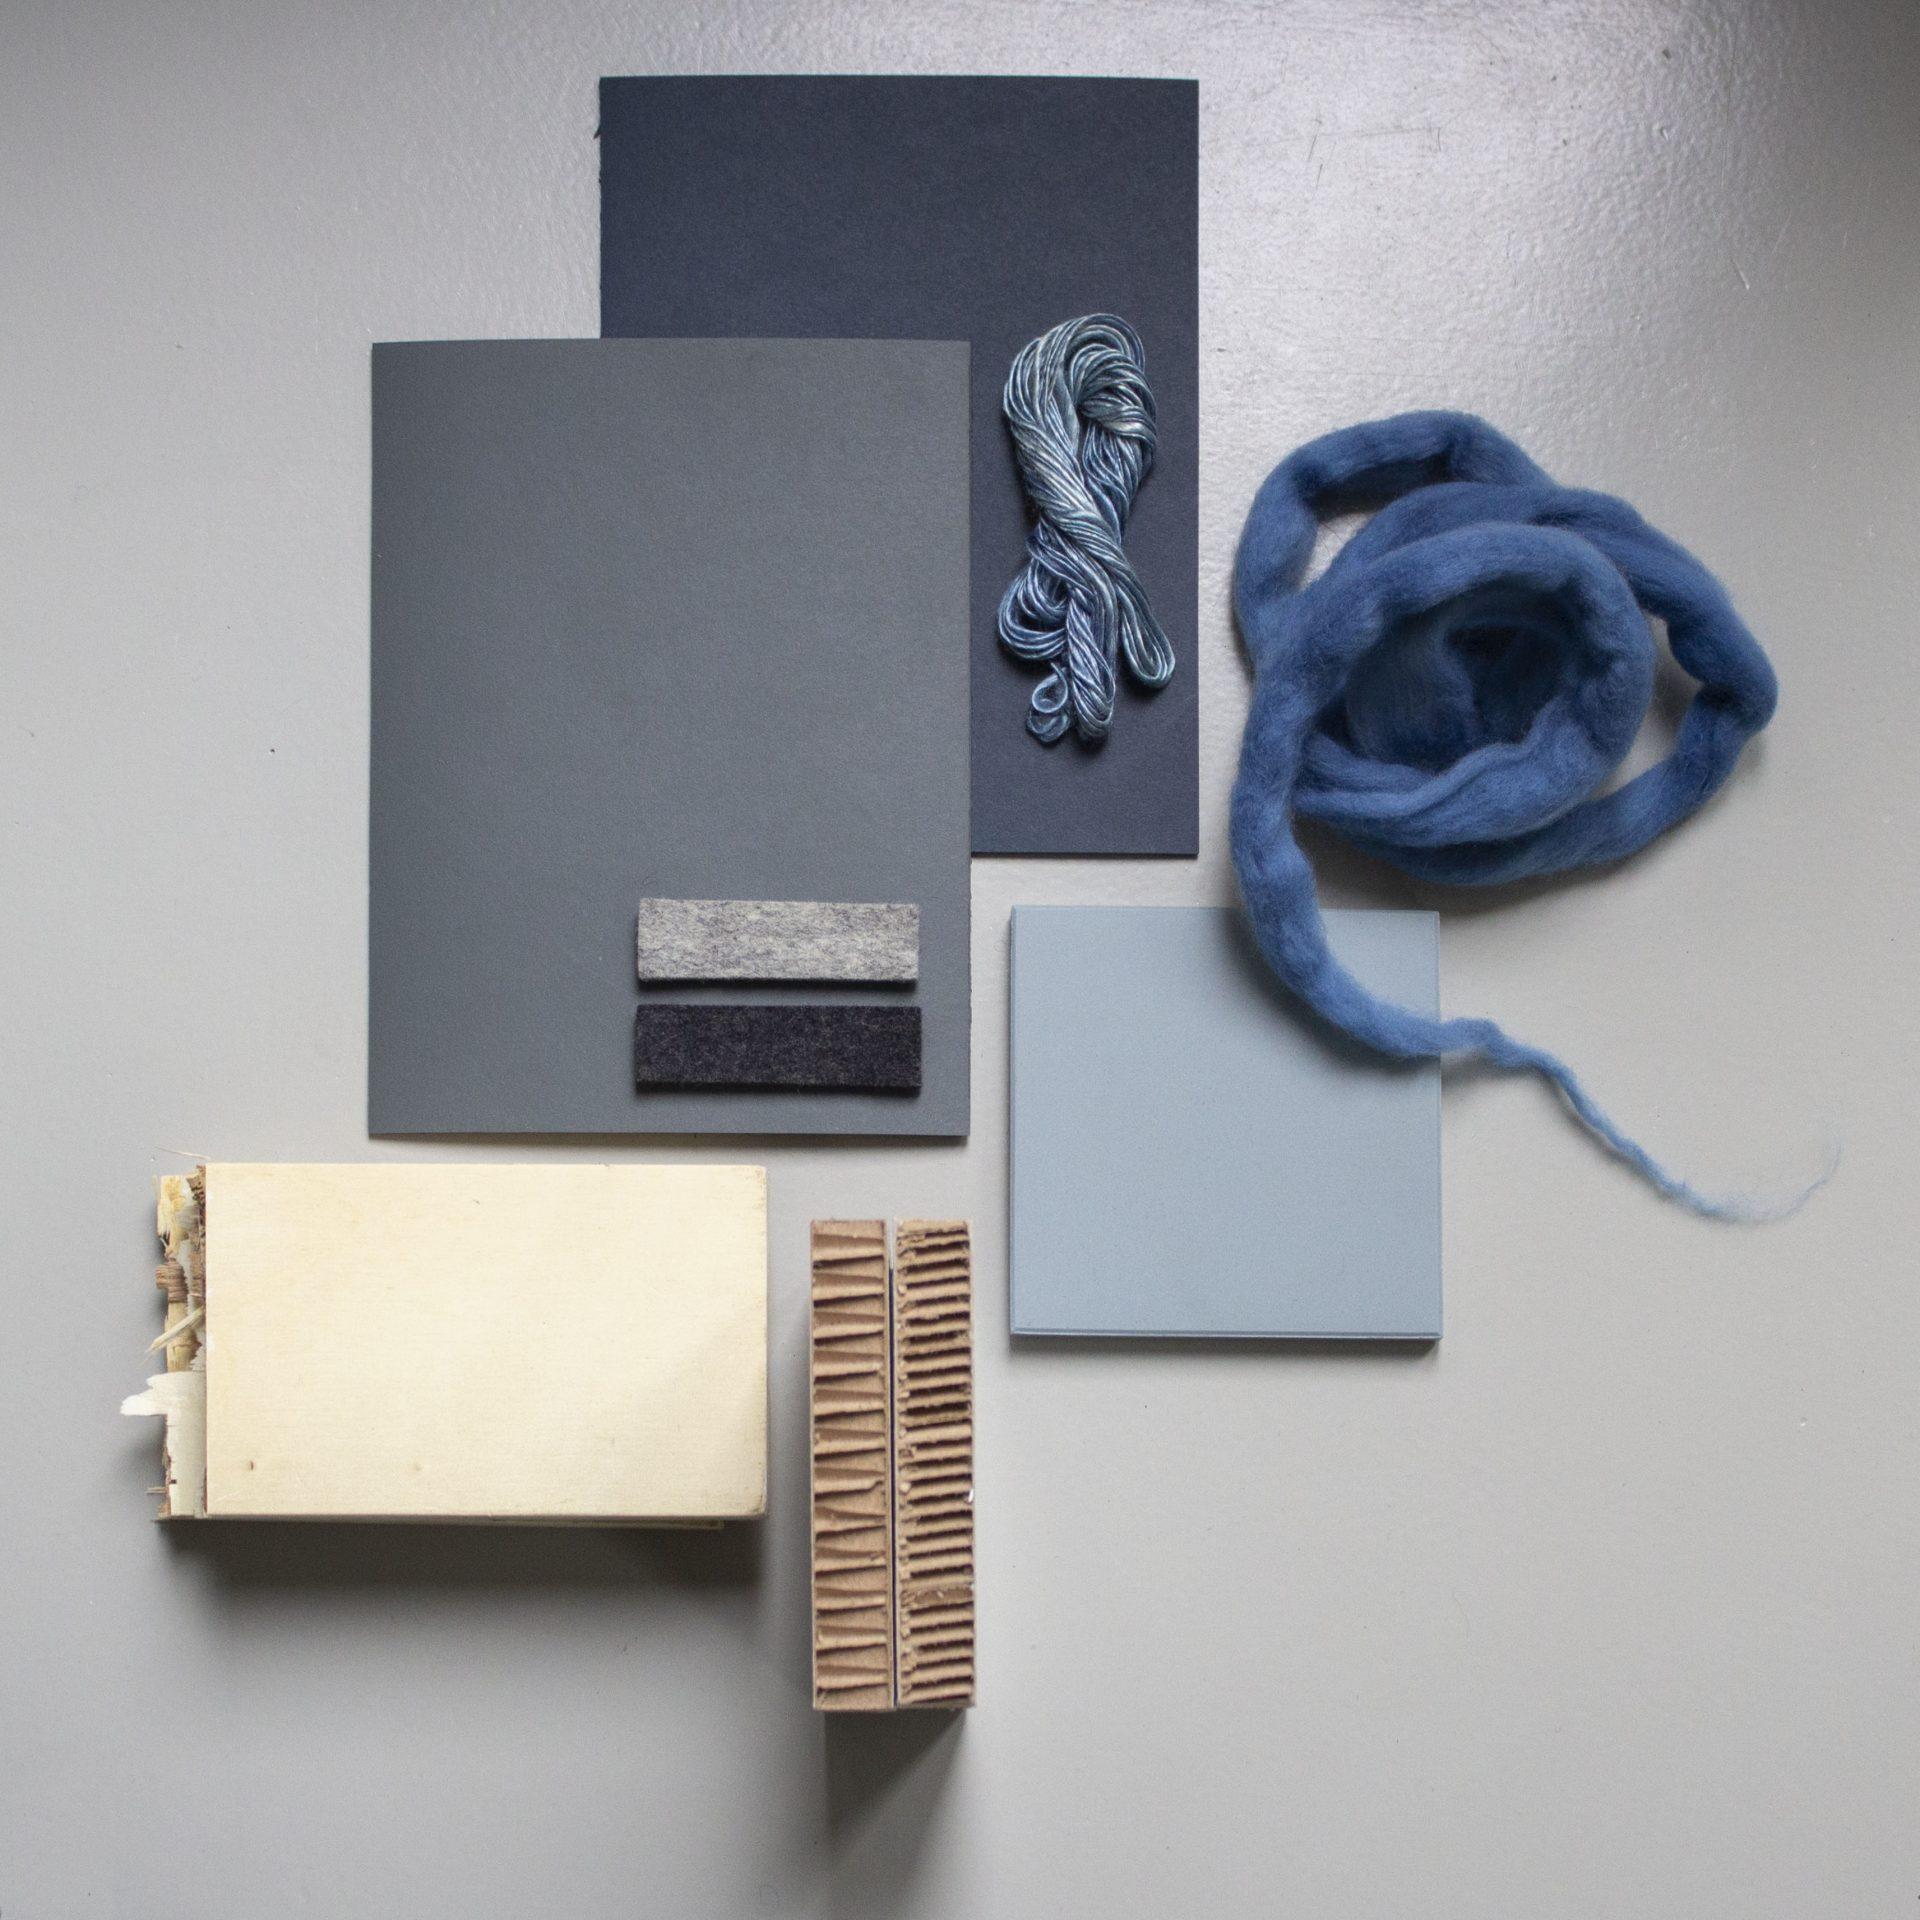 interieurontwerp moodboard kleur materiaal wol hout karton linoleum zijde tegel interieurarchitect binnenhuisarchitect binnenhuisarchitectuur interieur advies